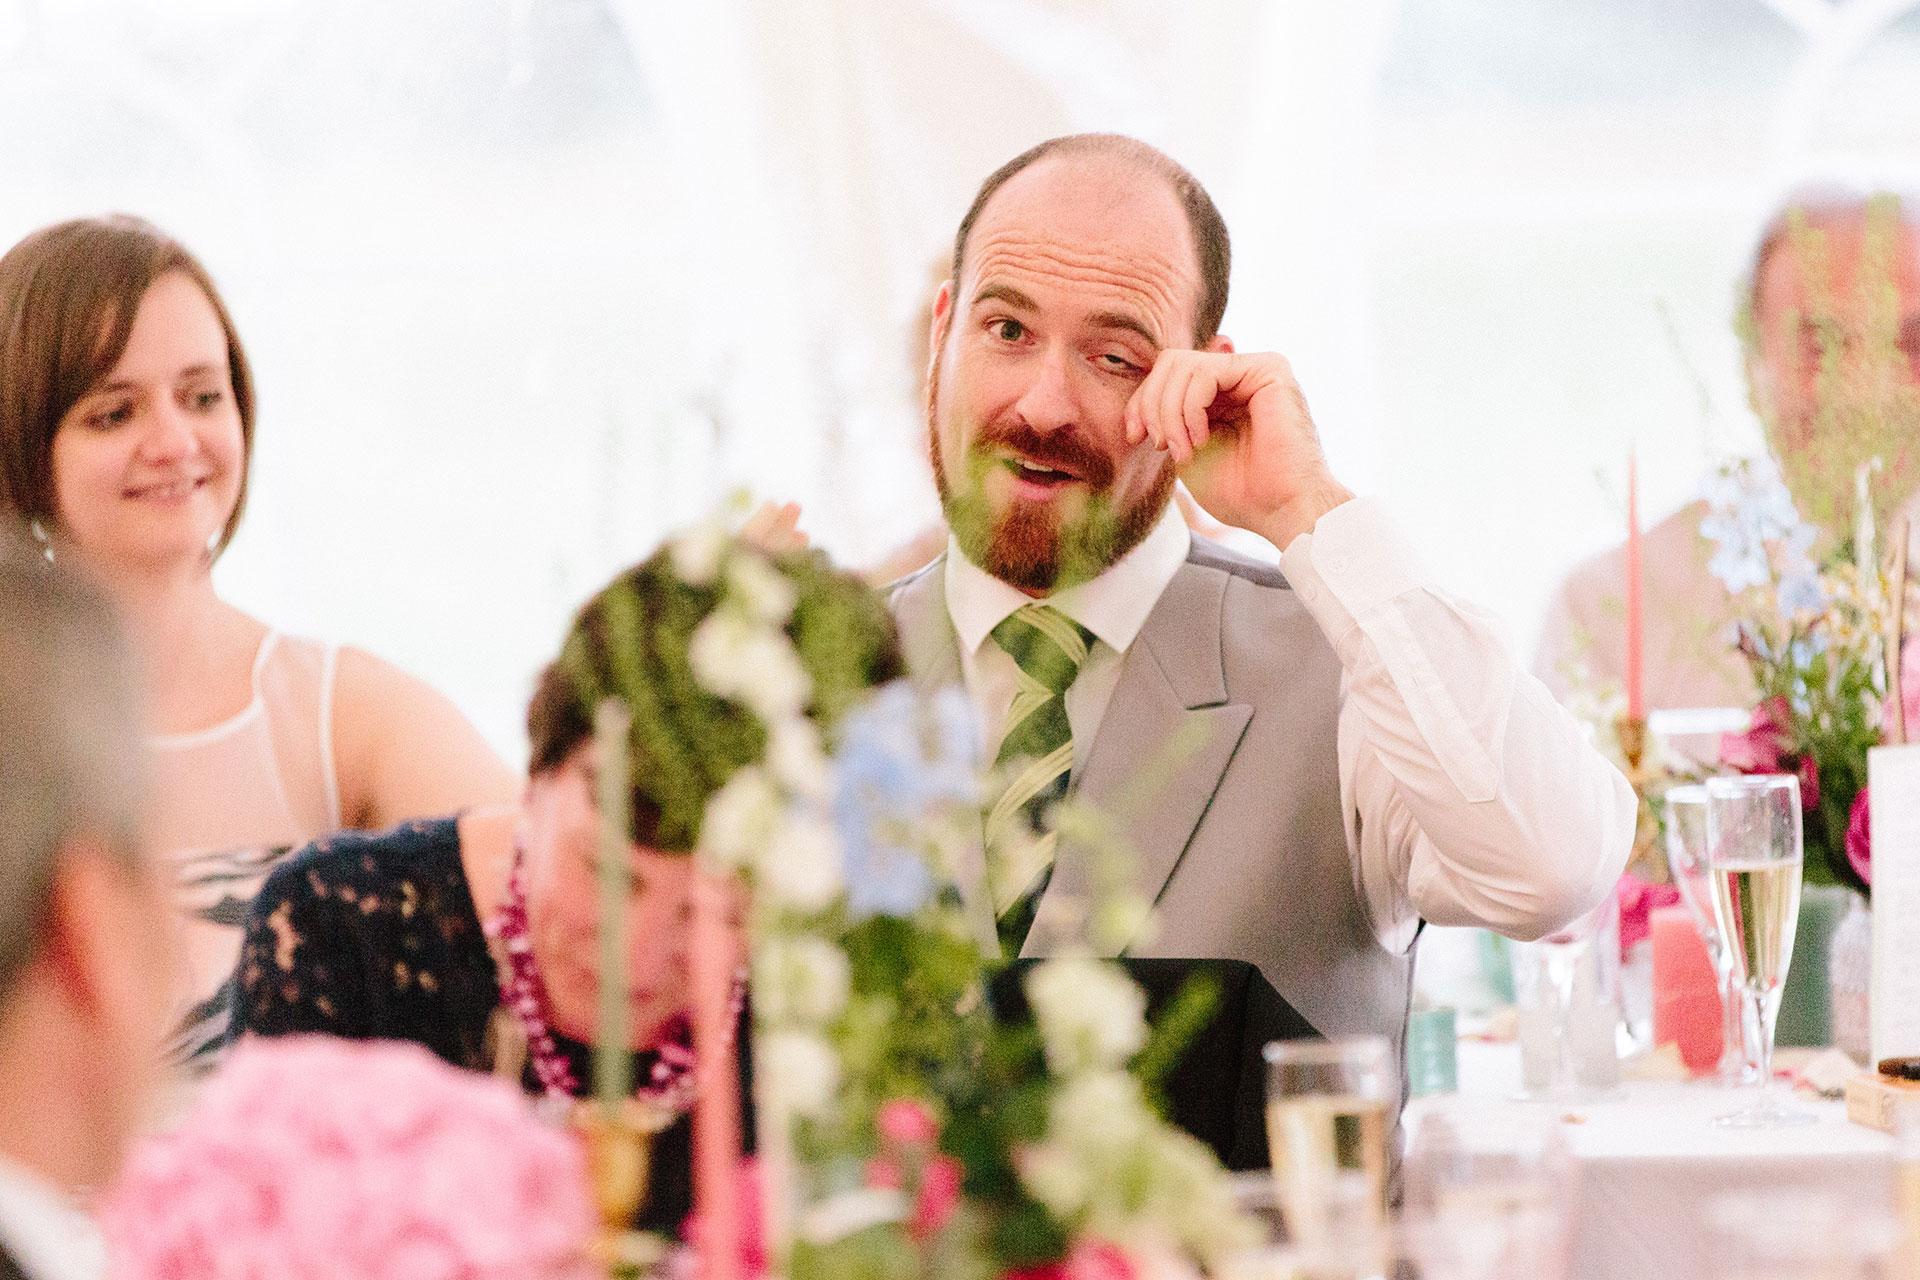 Langar-Hall-wedding-photographer-in-Nottinghamshire-Michael-Newington-Gray-95.jpg